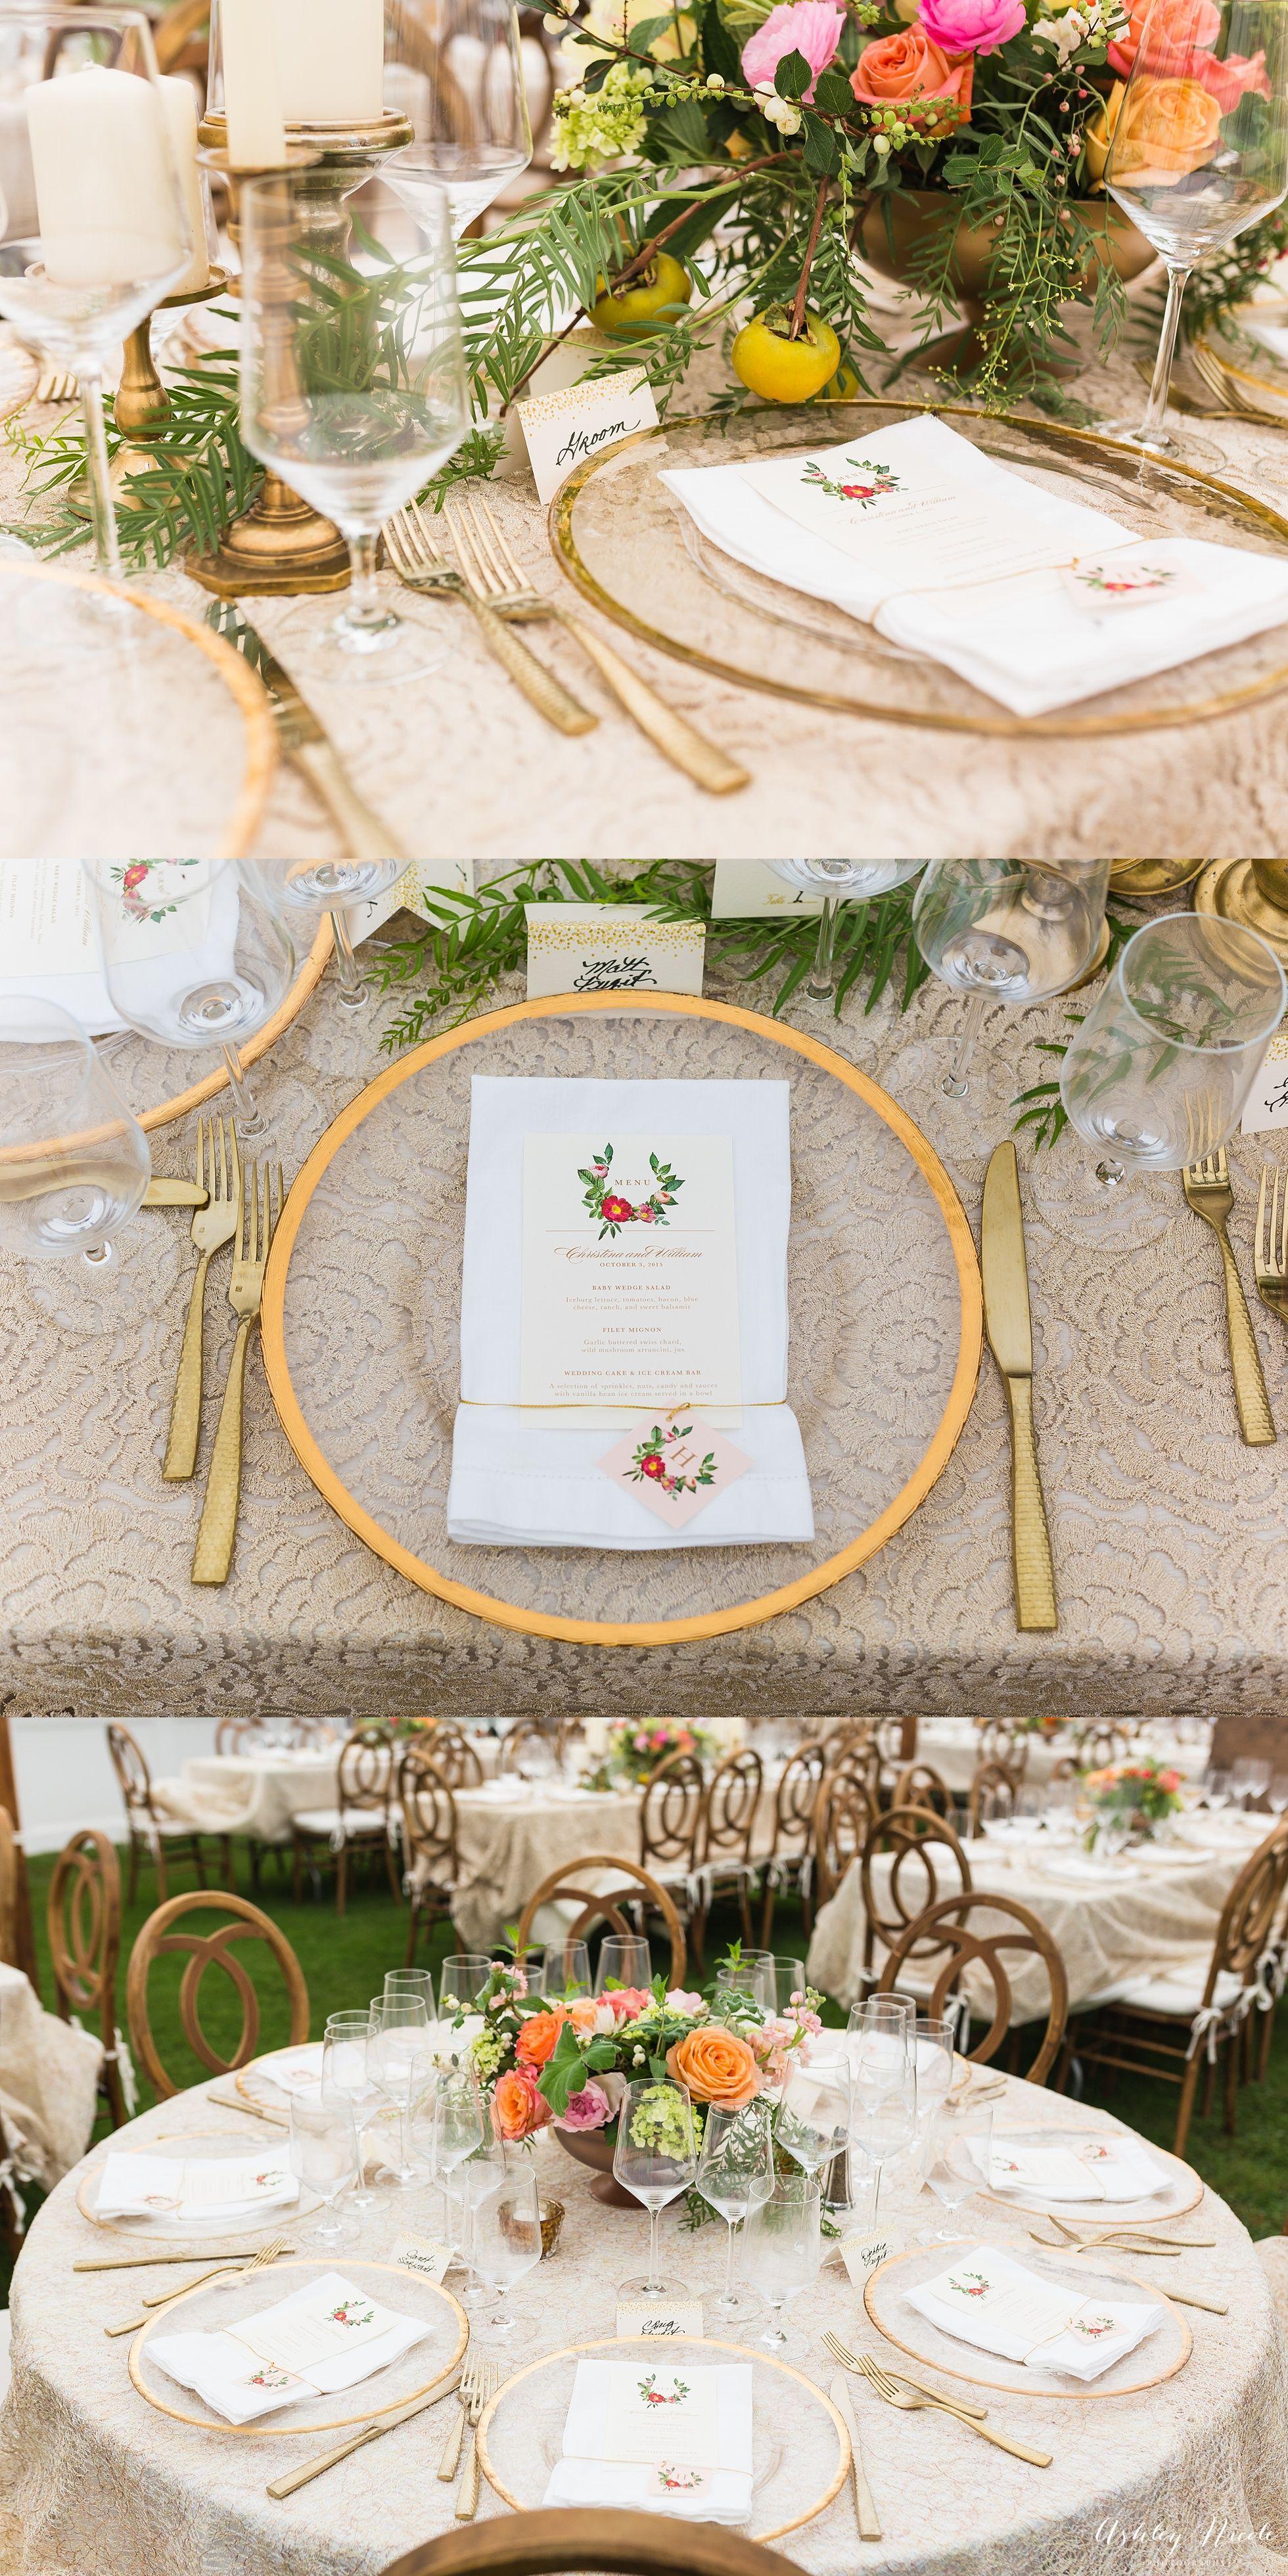 Wedding decoration ideas for tables  Aiken South Carolina Wedding  Calligraphy sign  Reception sign